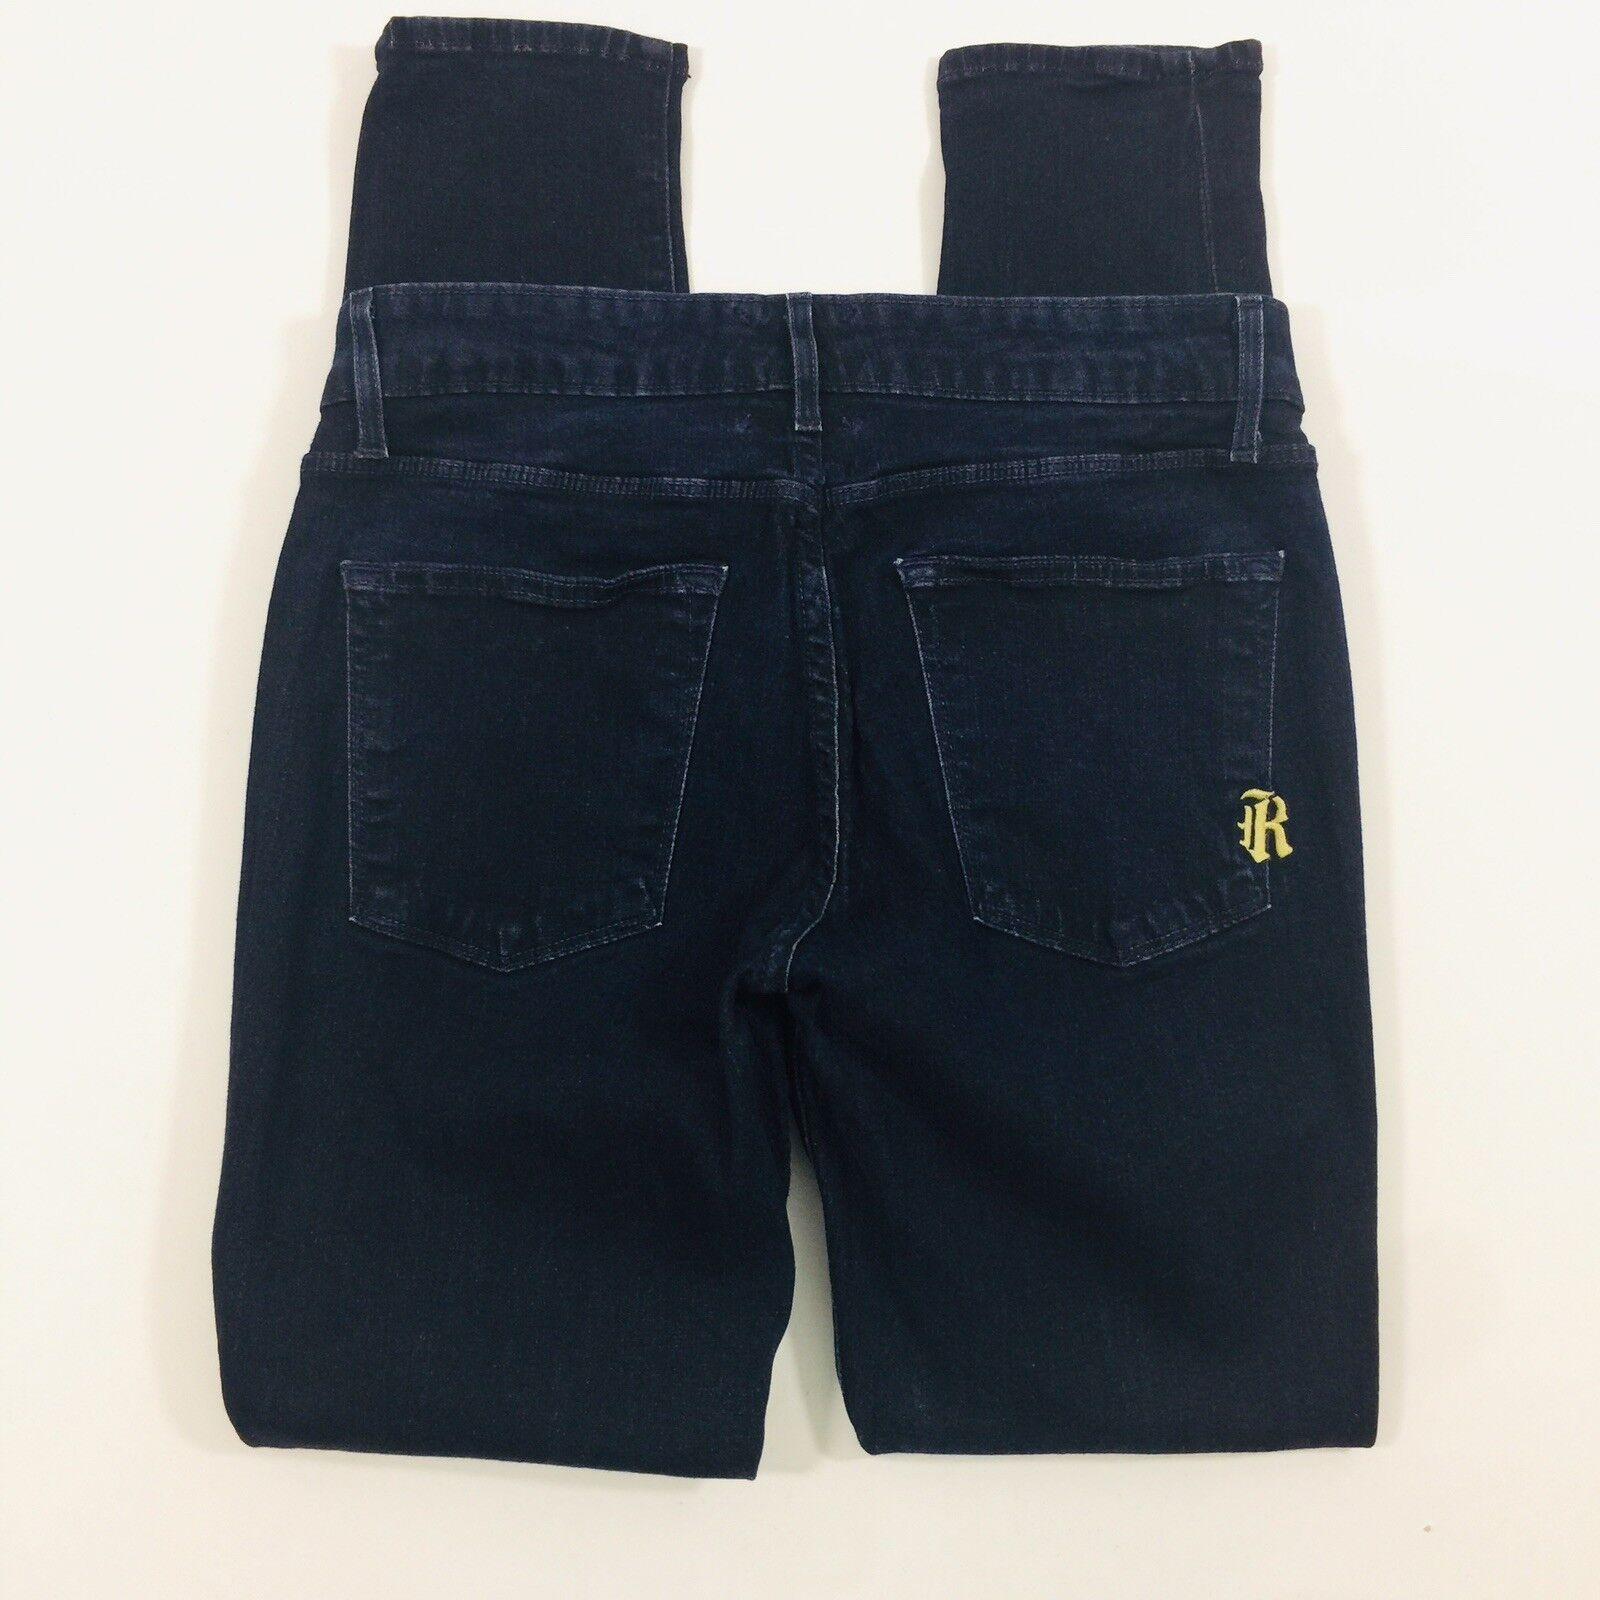 Rich & Skinny Nordstrom Womens size 30 Skinny Fit Dark Wash Cut A767Jeans